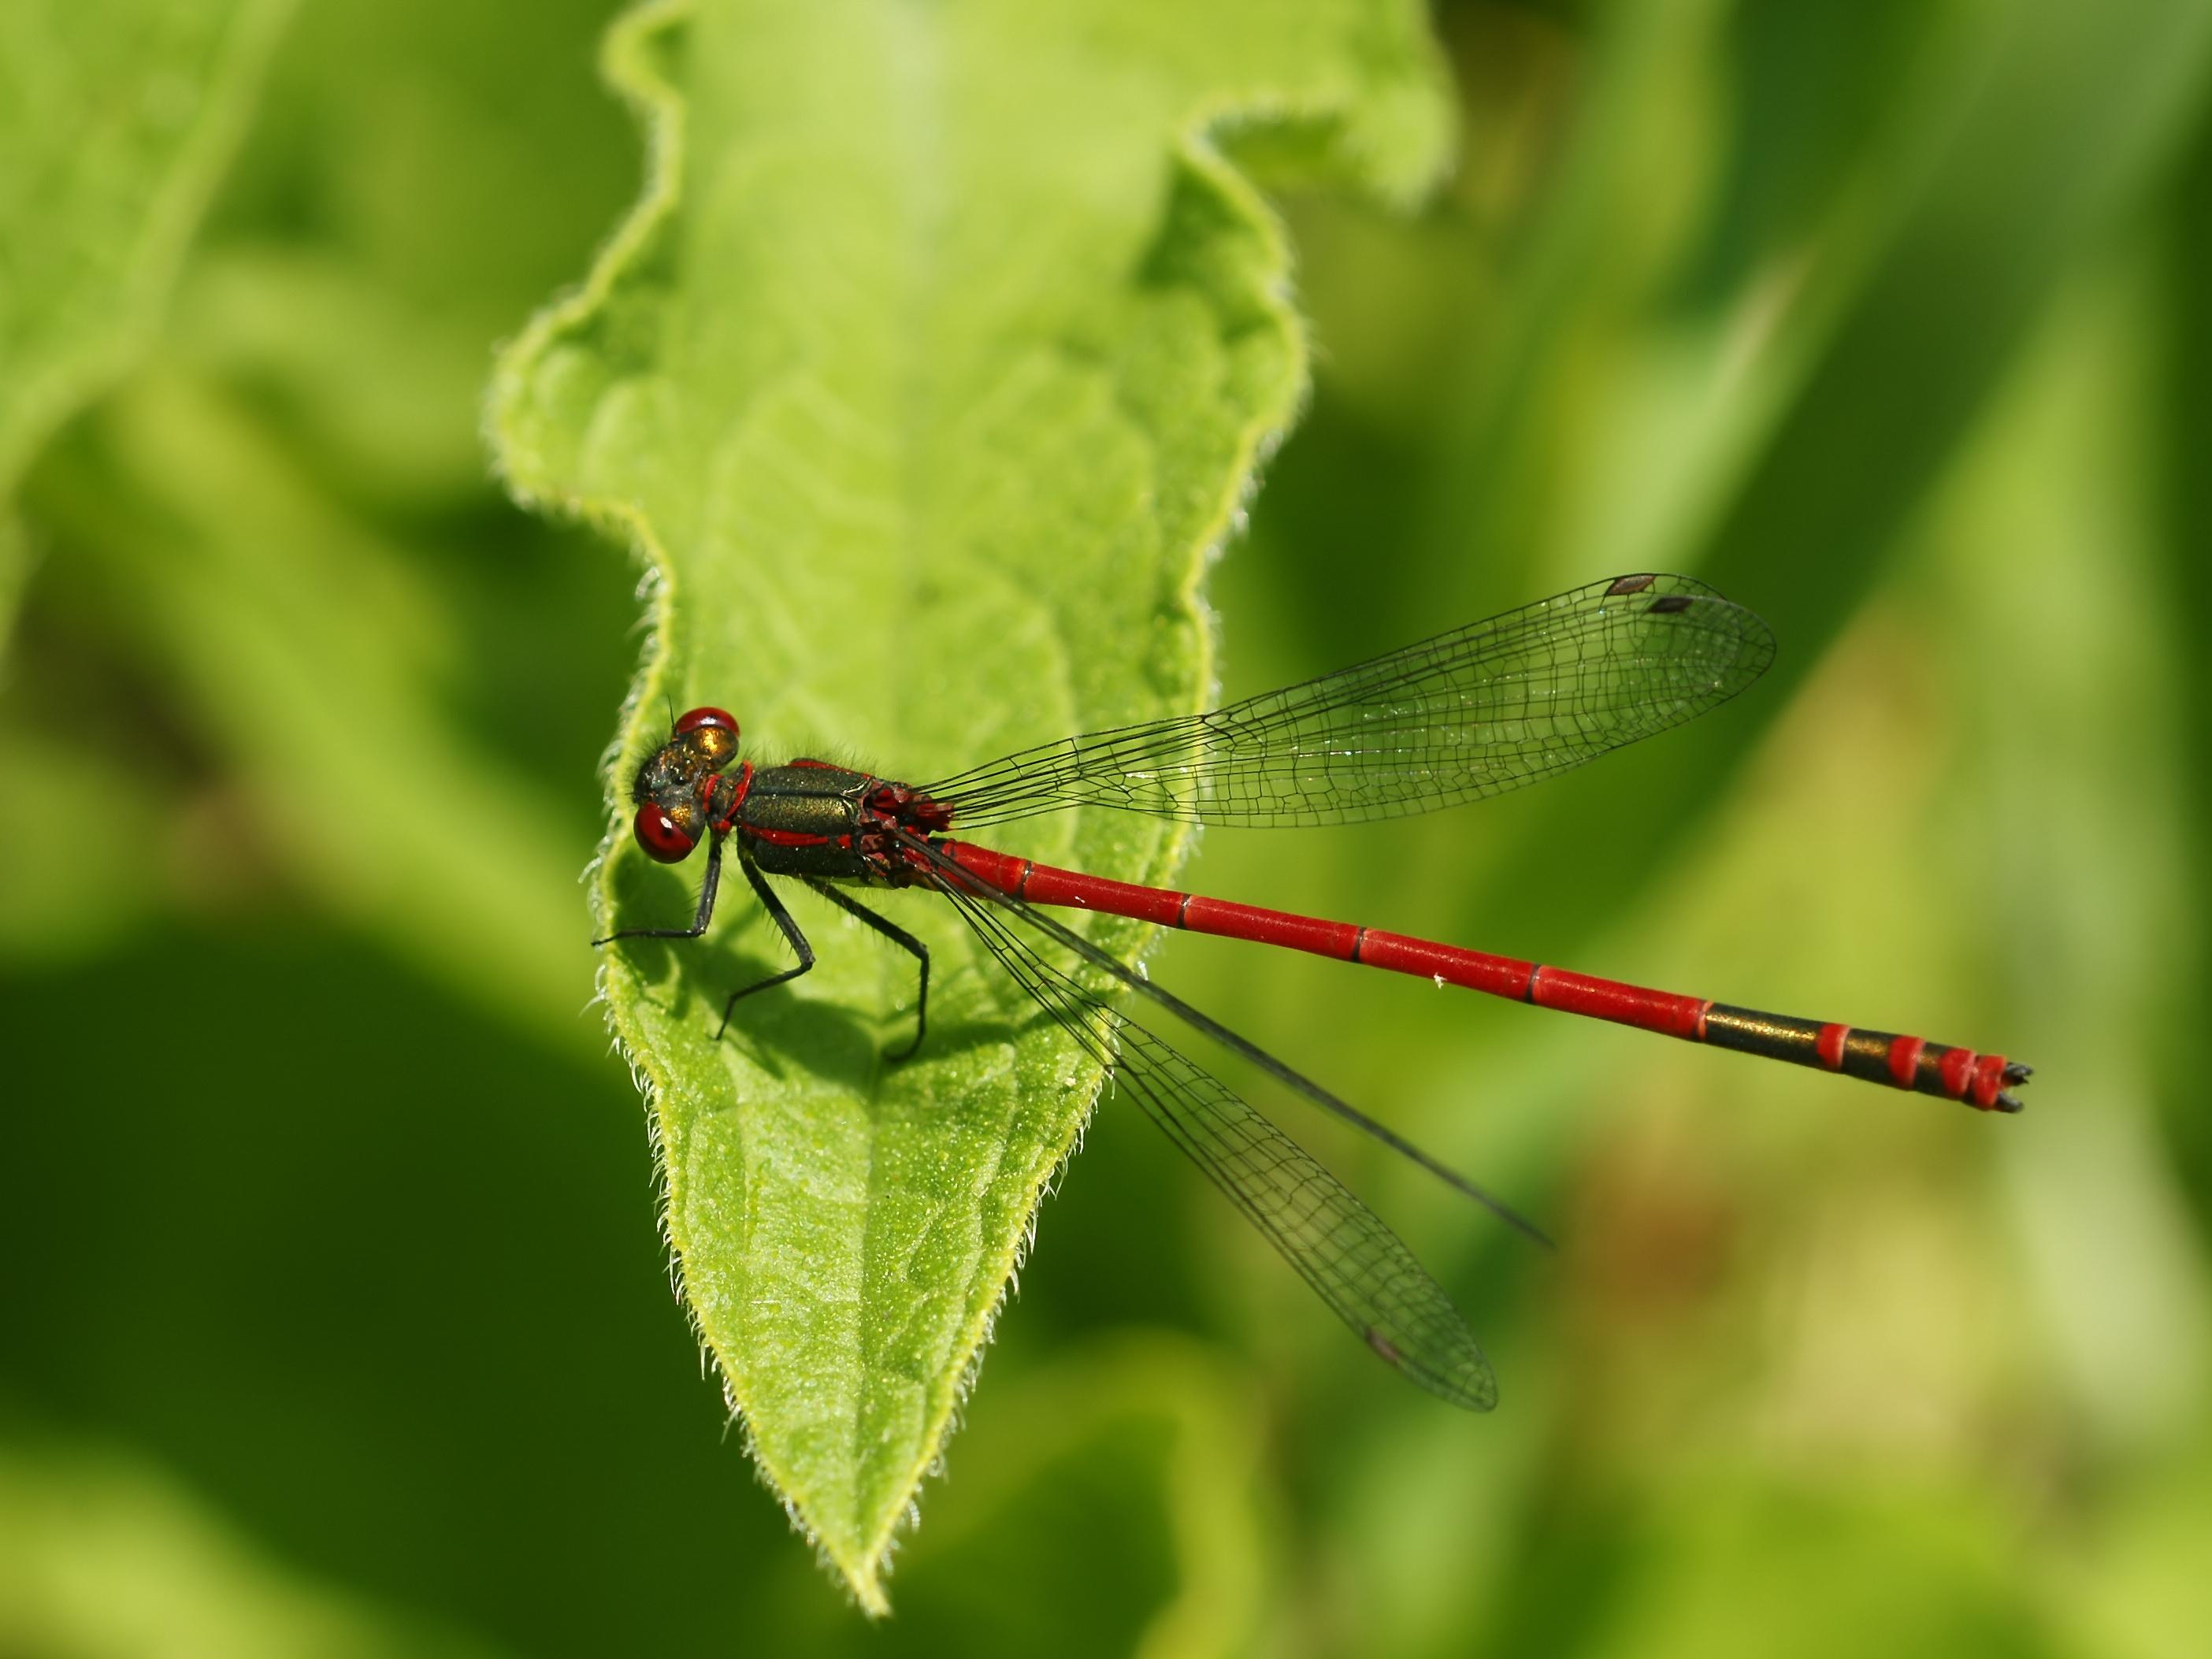 File:Pyrrhosoma nymphula.jpg - Wikimedia Commons